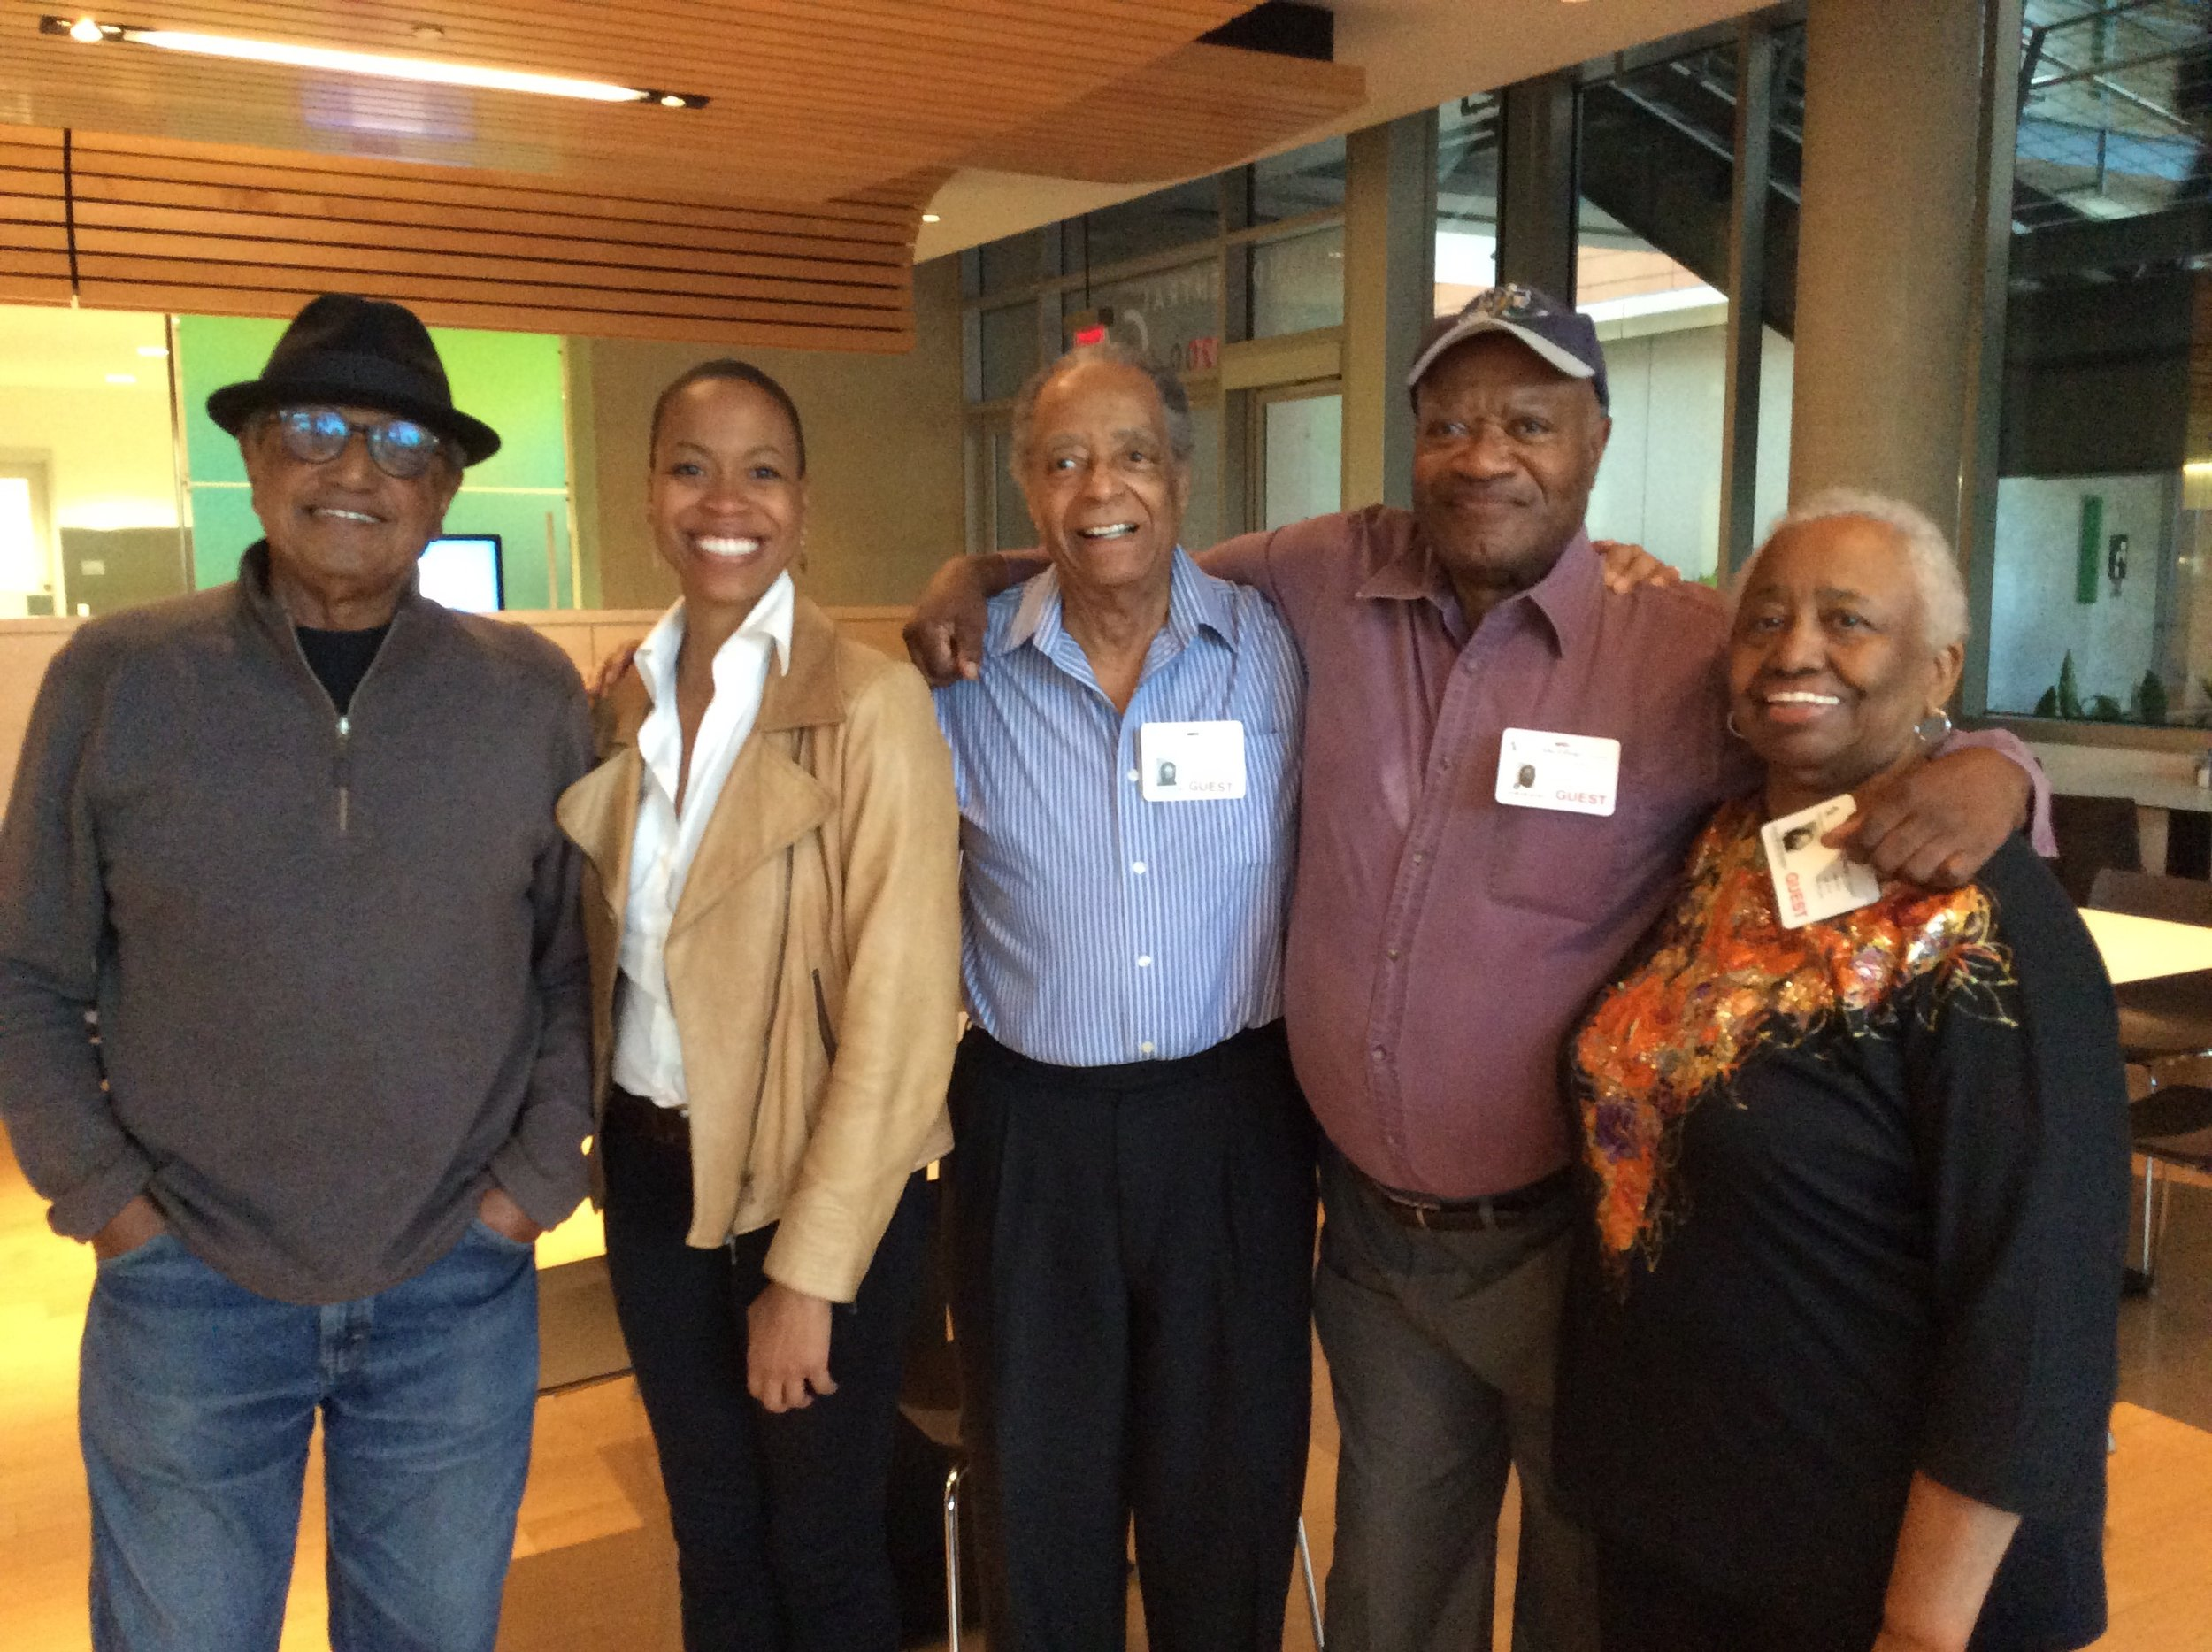 Floyd Norman, Dr. Rhea Combs, Norman E. Edelen, Leo D. Sullivan and Lyn Sullivan. Remembering Vignette Films and the Sixties.